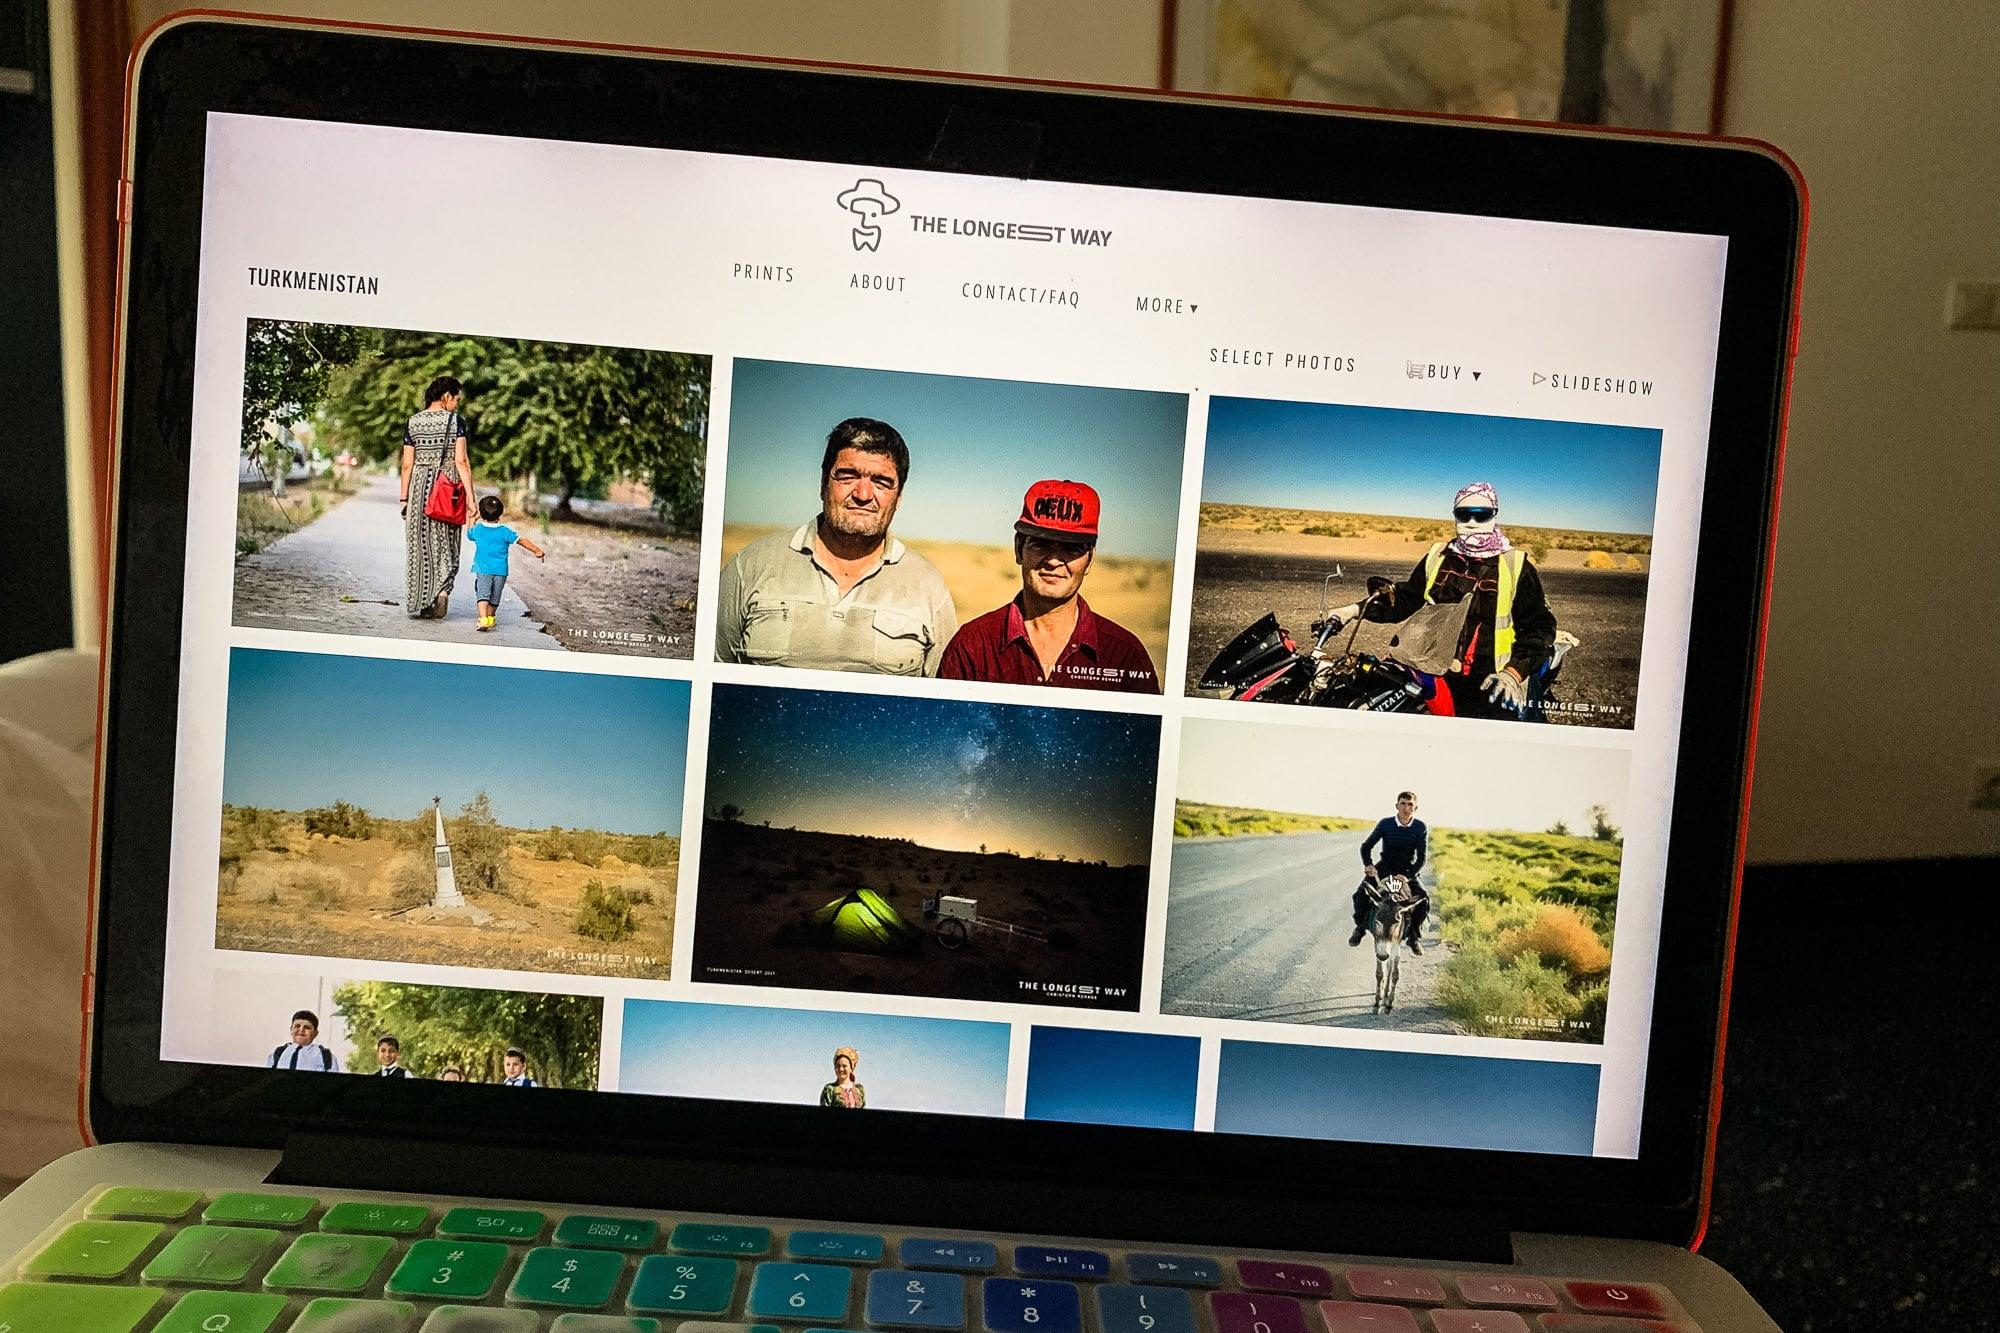 Turkmenistan album